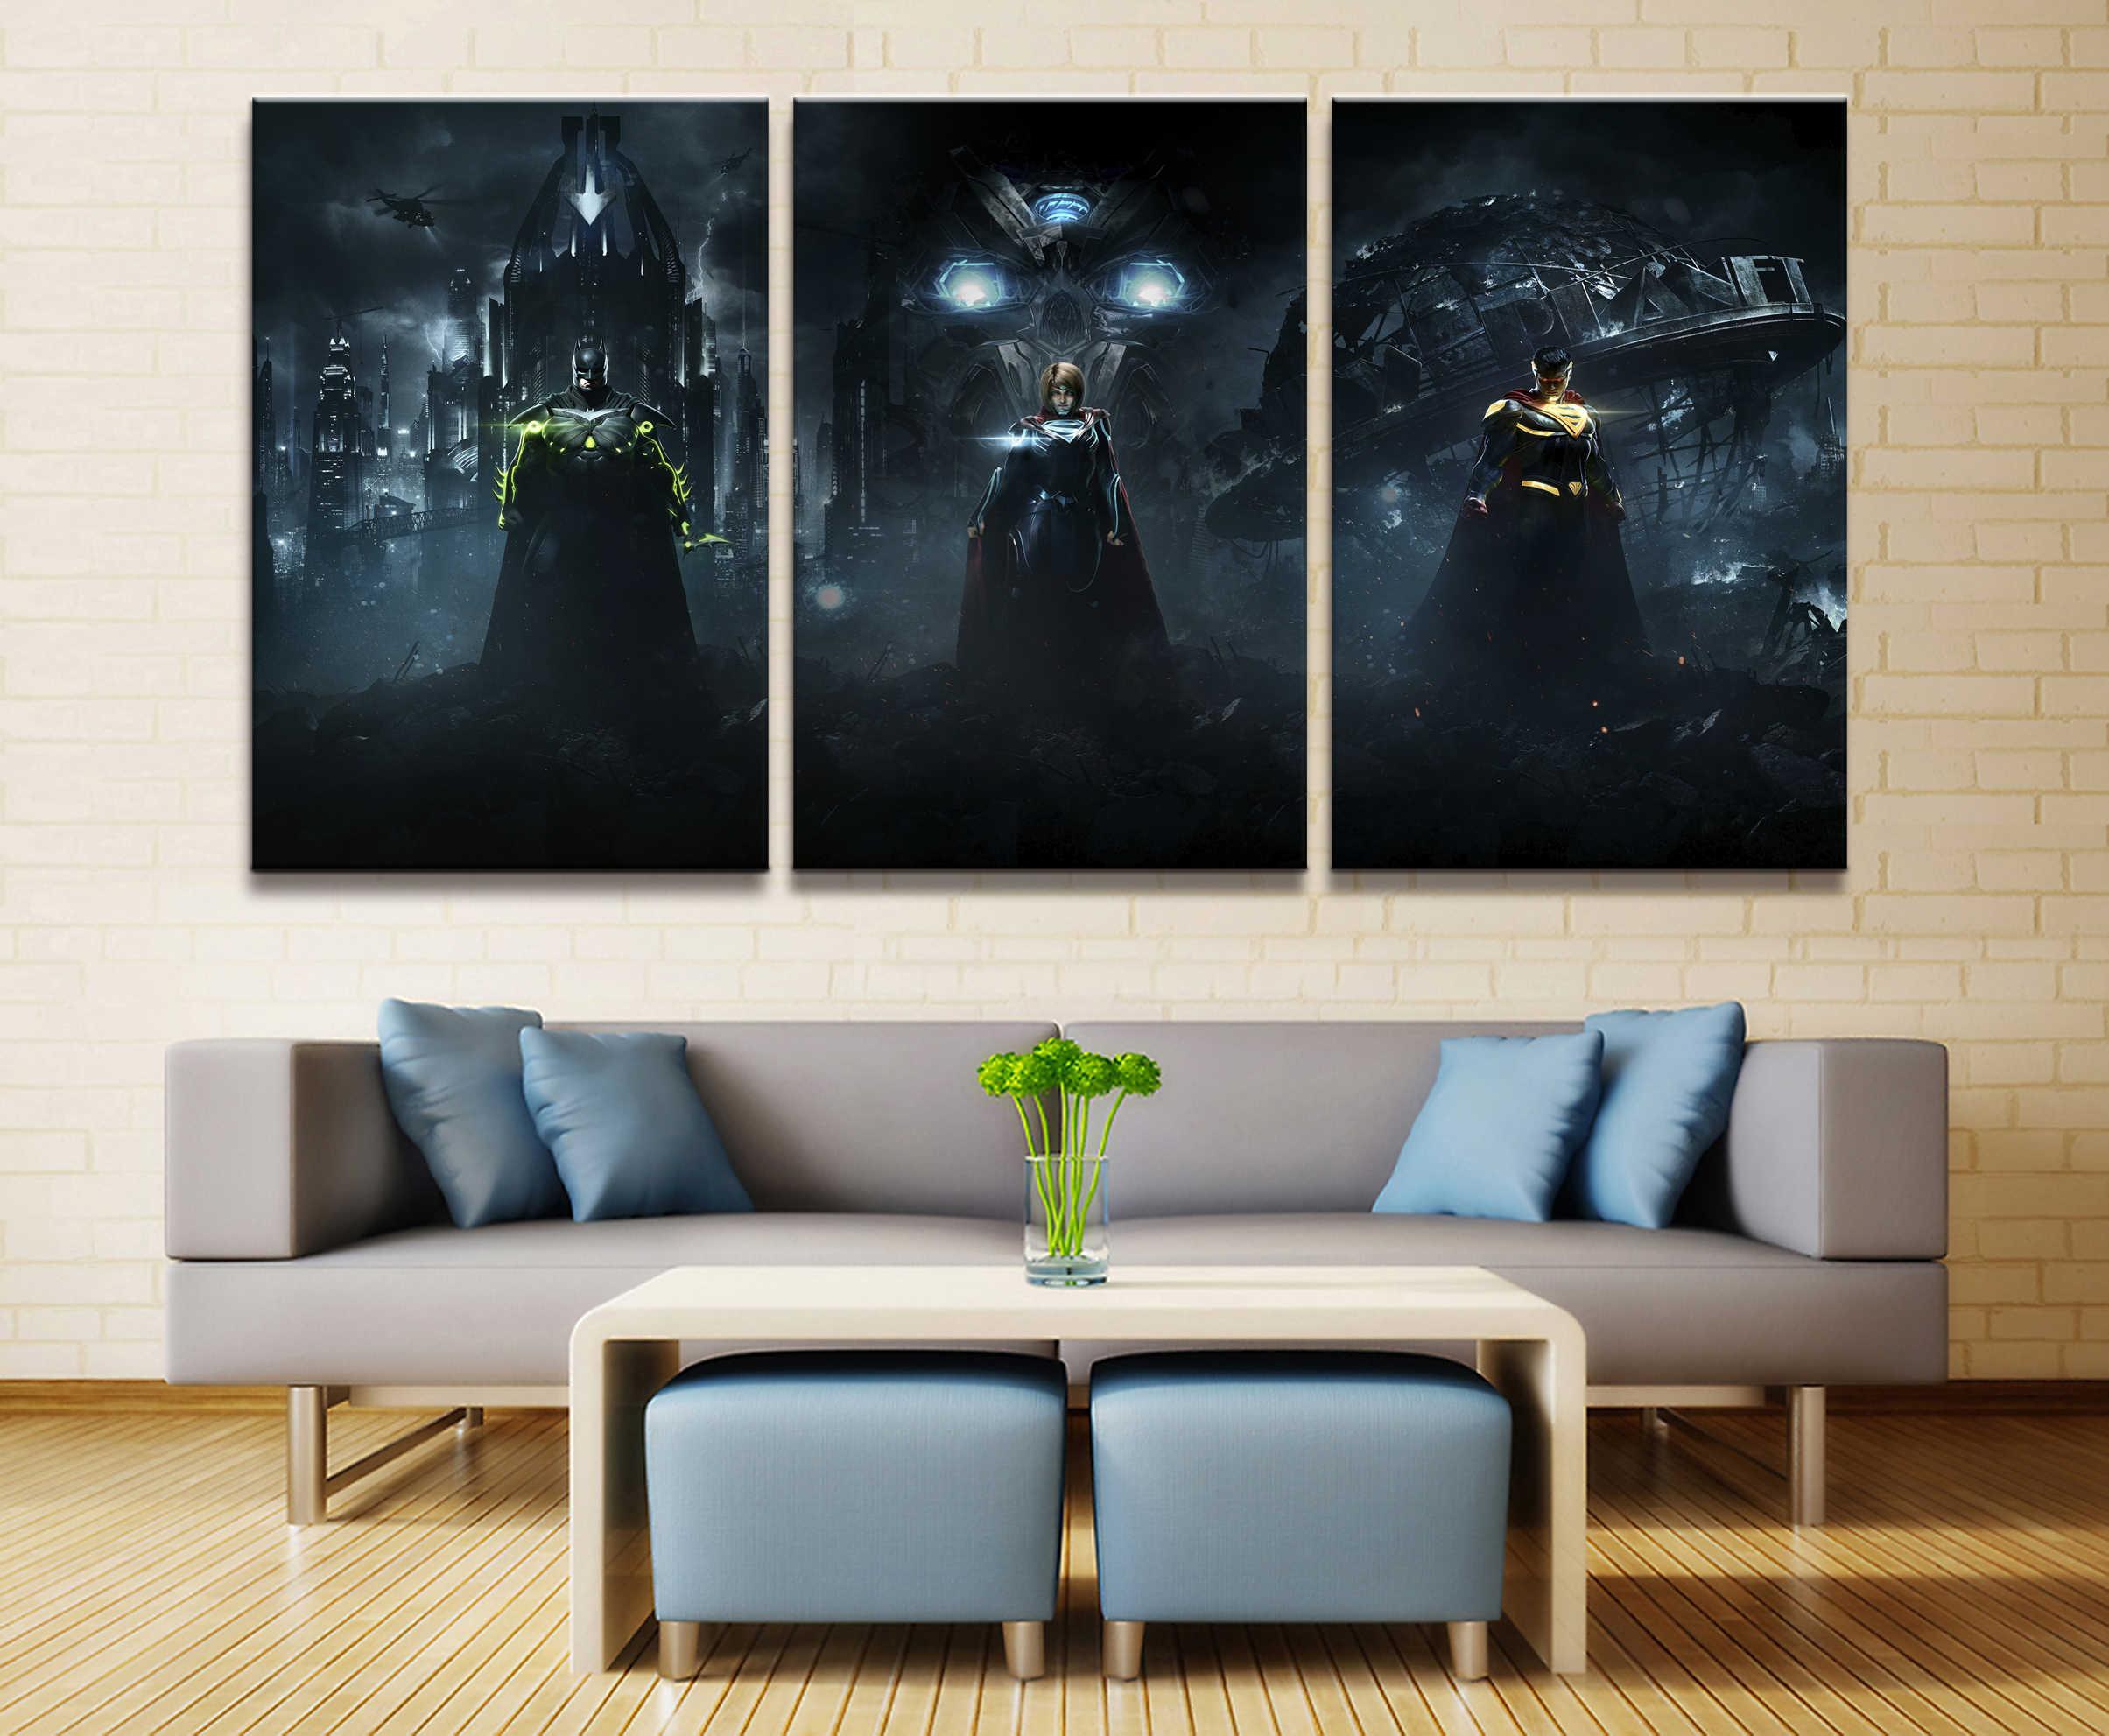 Printed Canvas Poster Framework Home Decor Wall 3 Pieces Superman Batman Movie Mark For Living Room q50